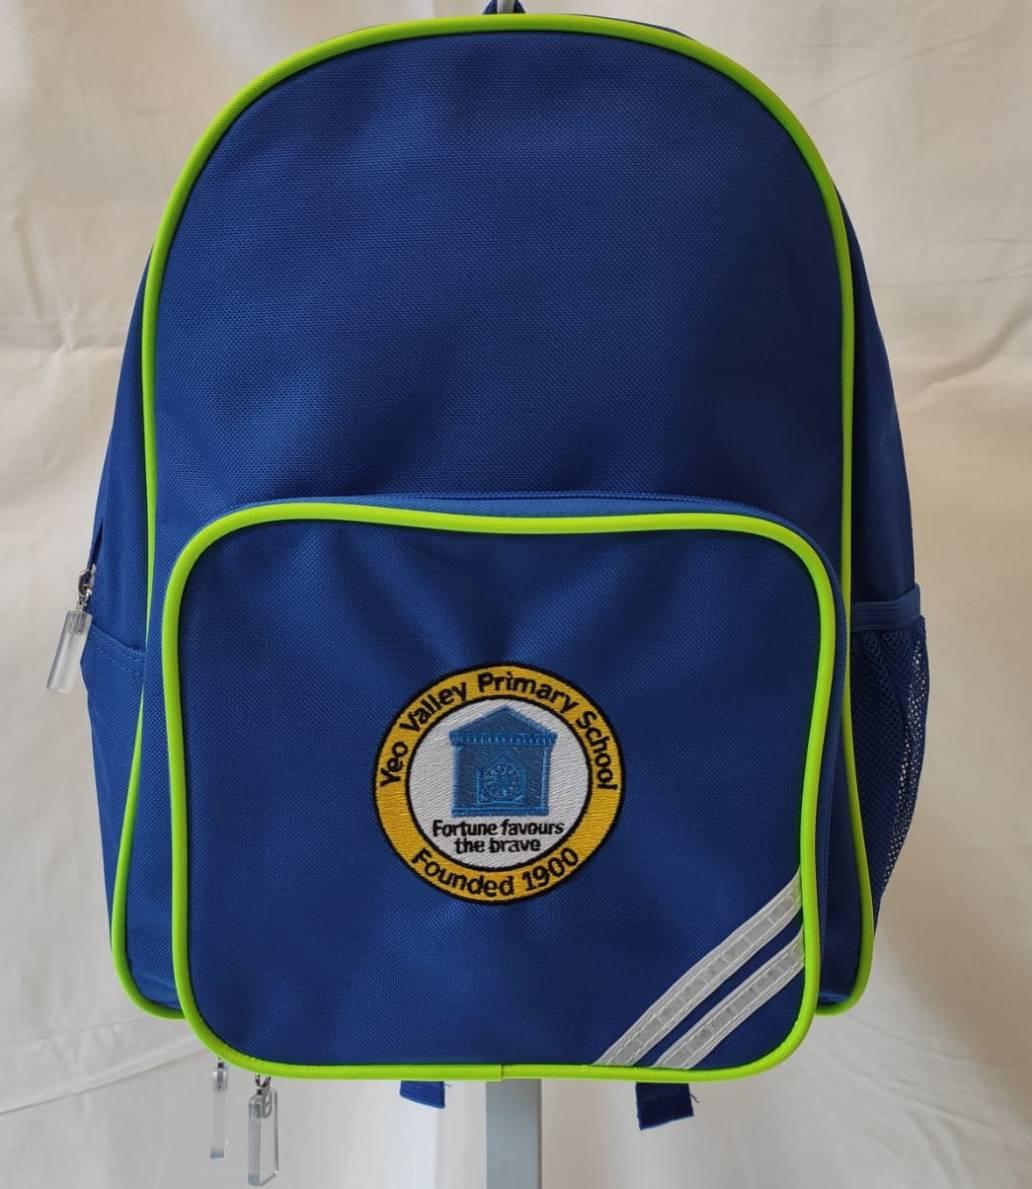 Yeo Valley Primary School Backpack